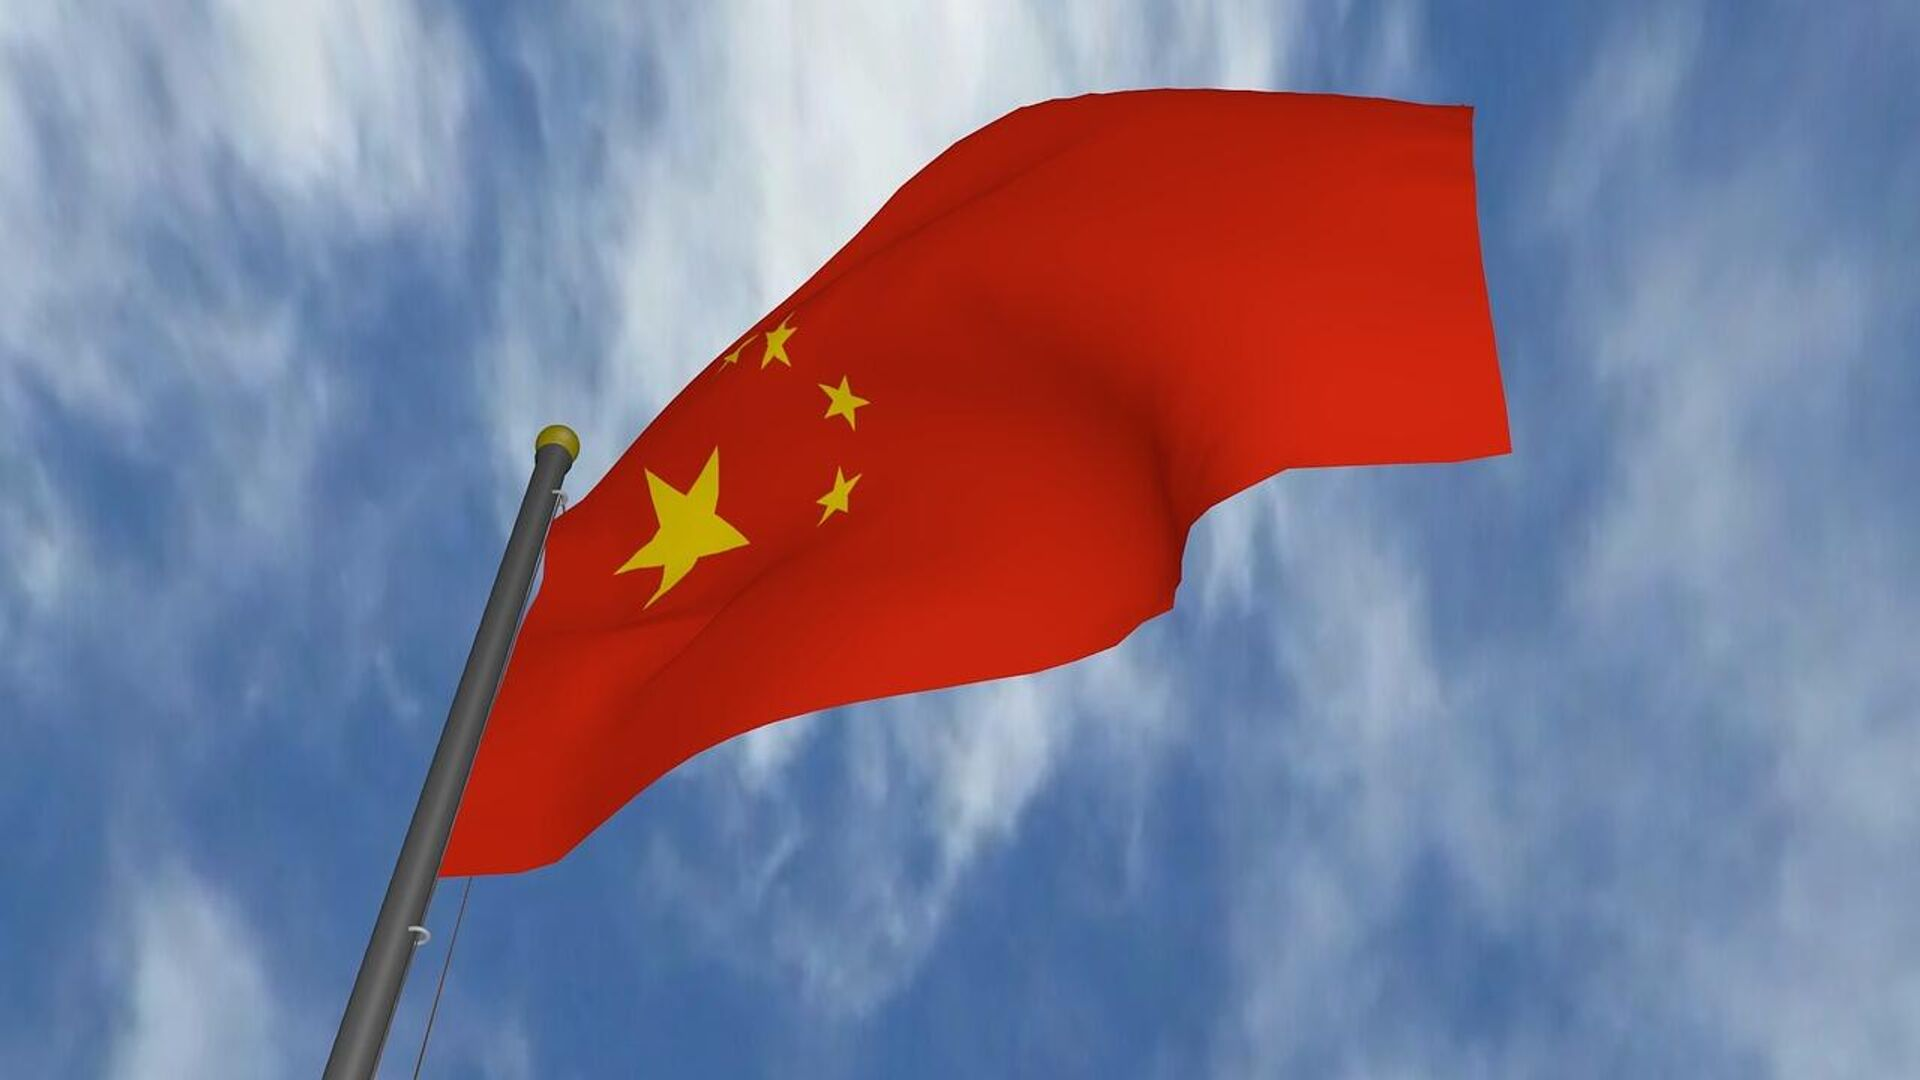 Bandera china - Sputnik Mundo, 1920, 14.08.2021